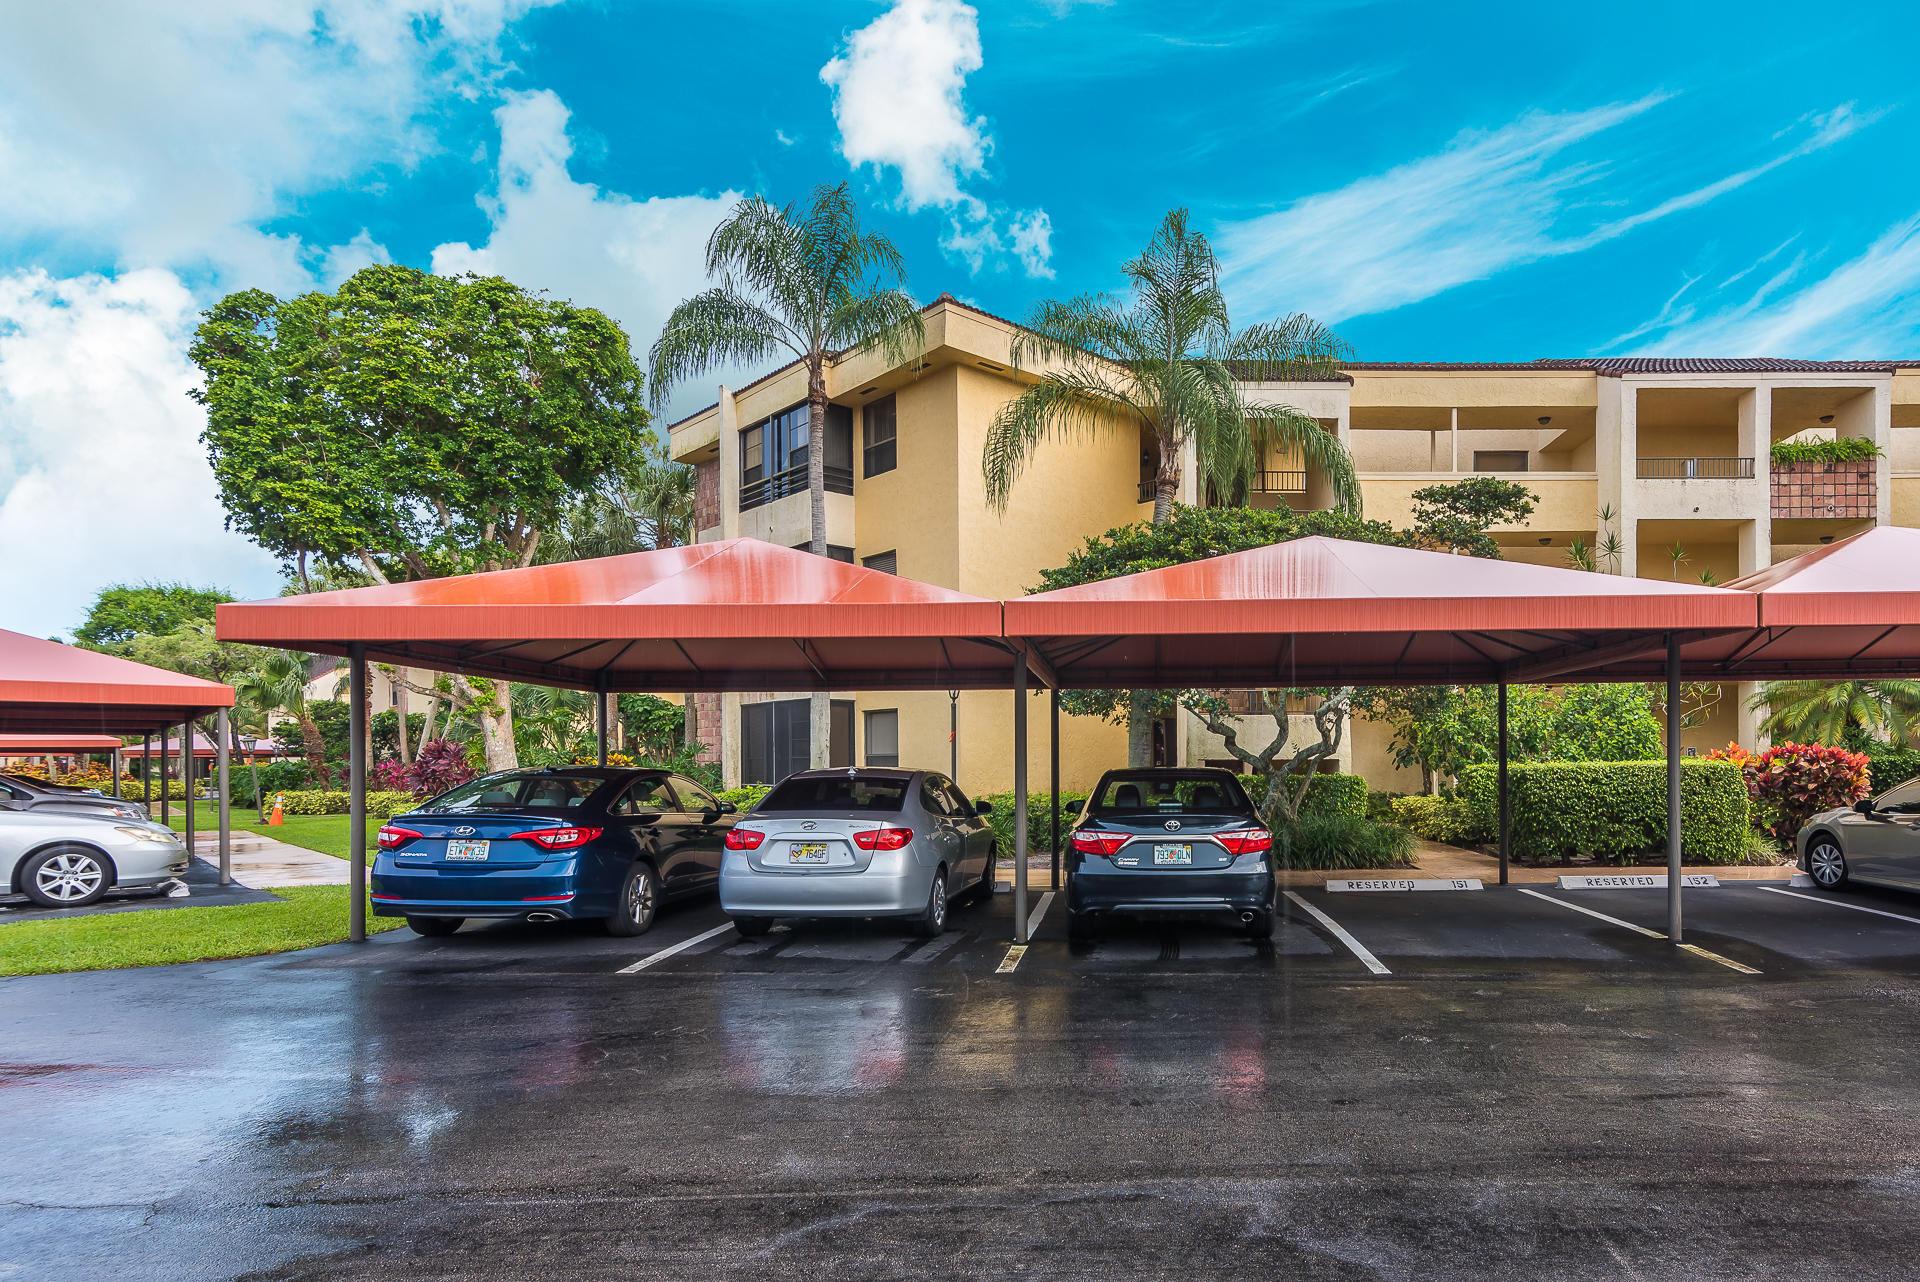 7520 La Paz Court #109 Boca Raton, FL 33433